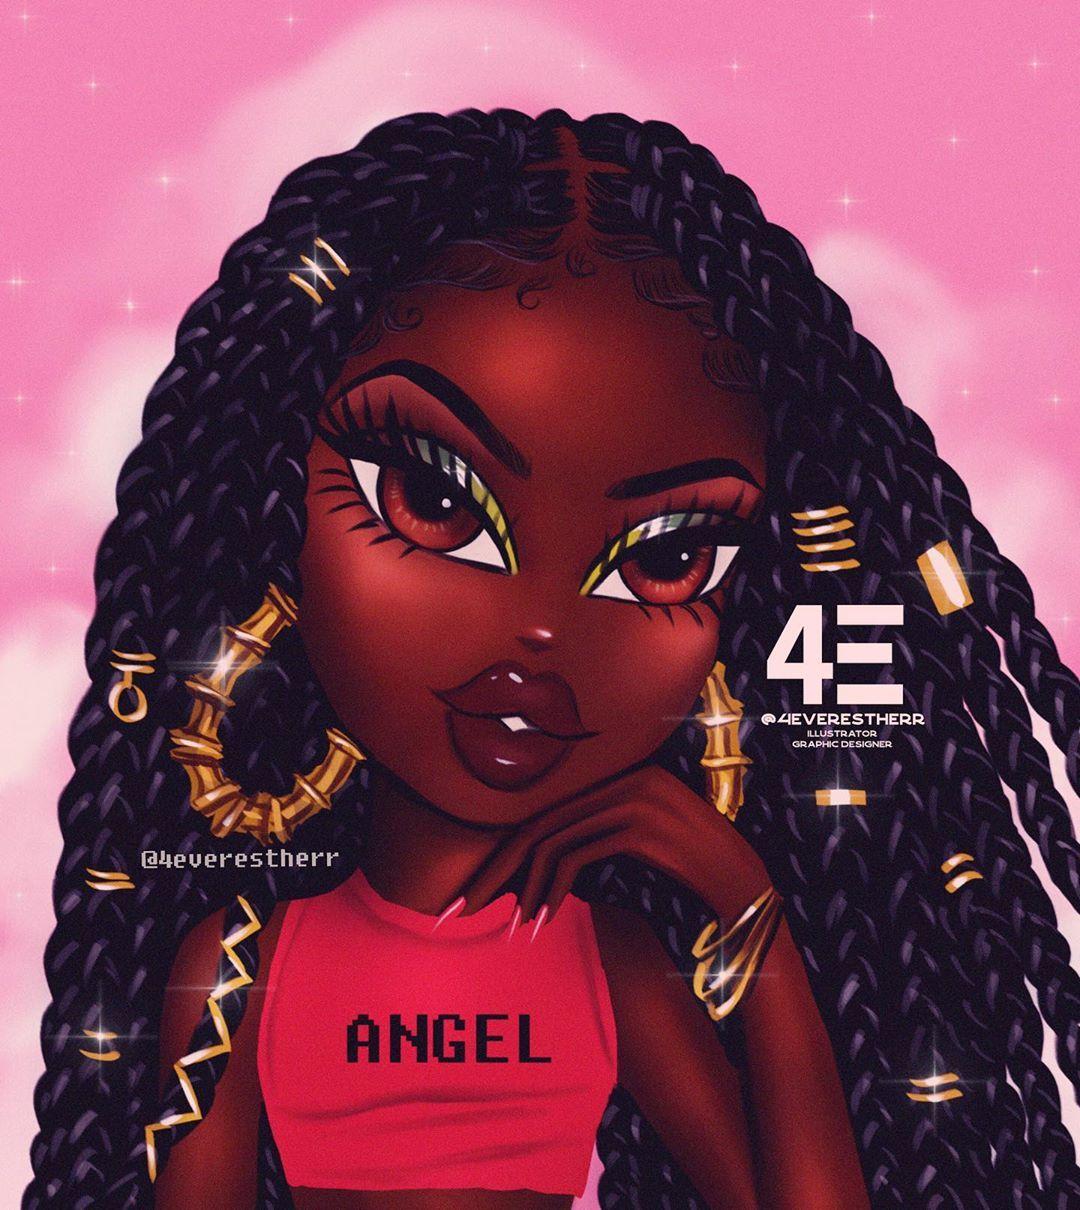 Estherr Luntadila On Instagram Bratz X Box Braids Commissions Are Back On September 1 Drawings Of Black Girls Black Girl Art Black Bratz Doll